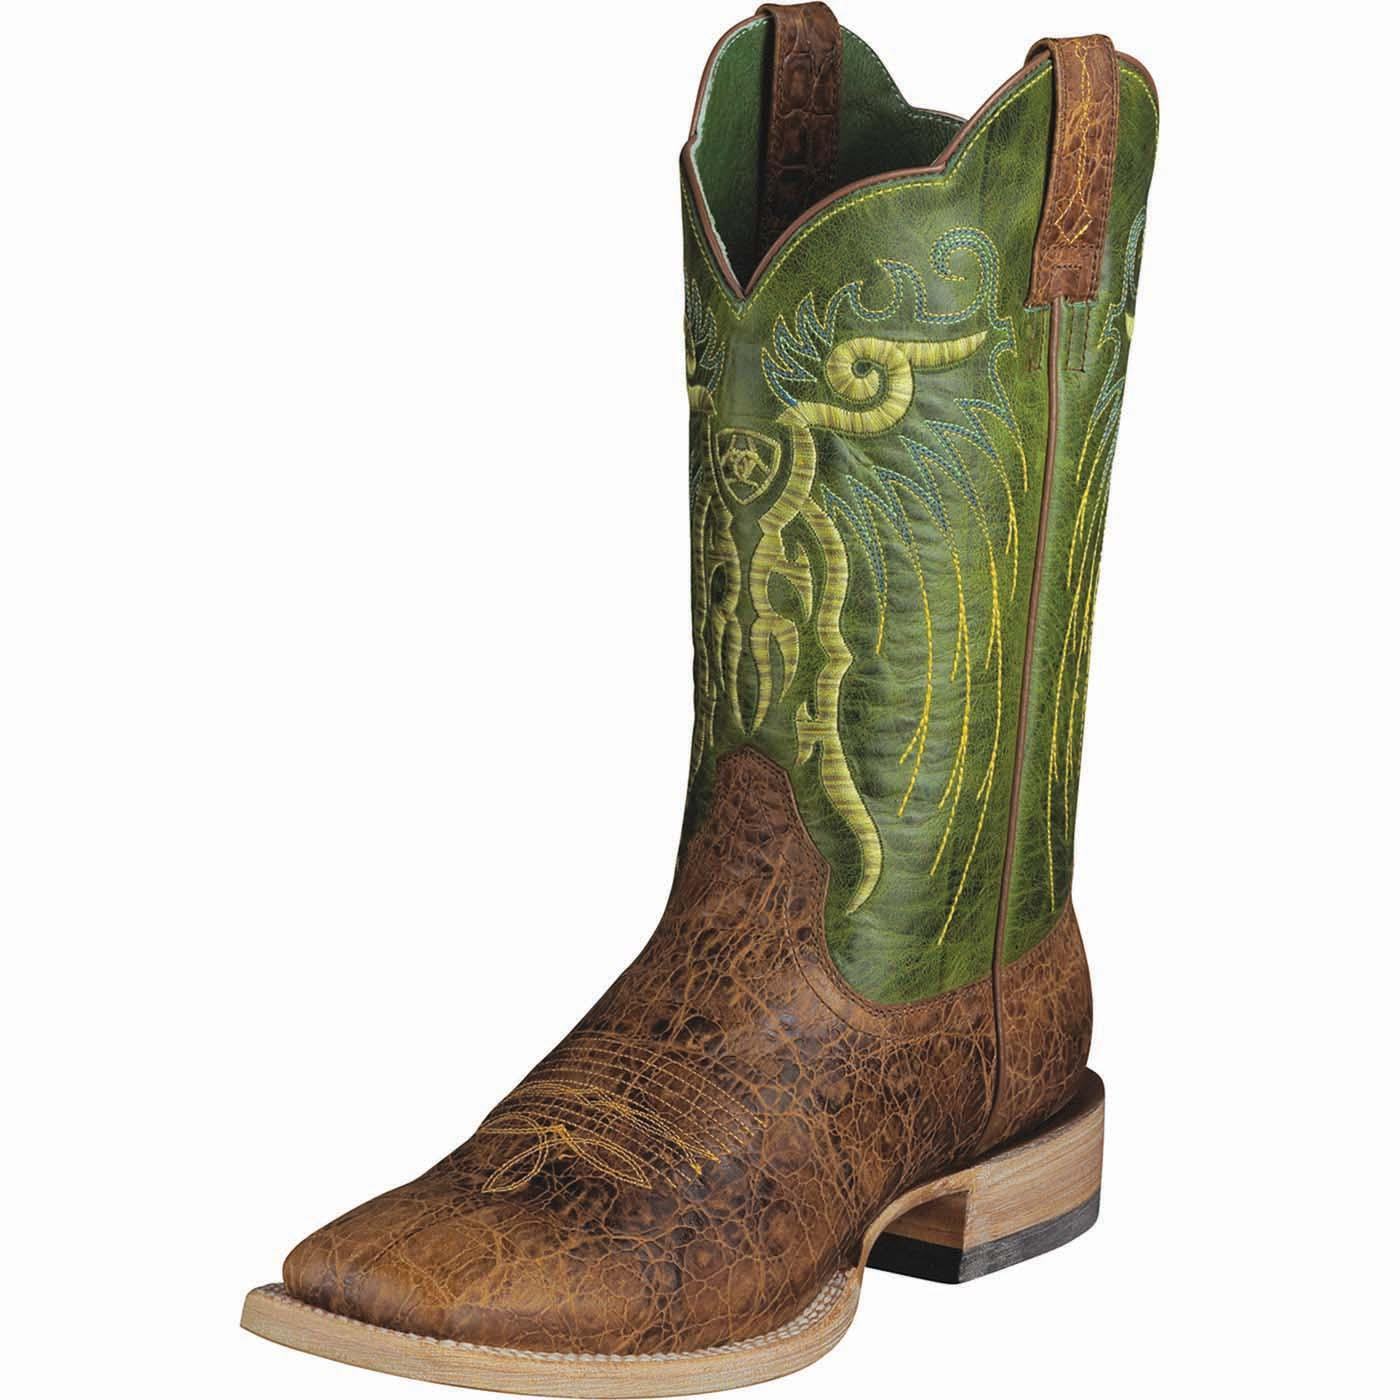 Ariat Mesteno Western Boot 10006841